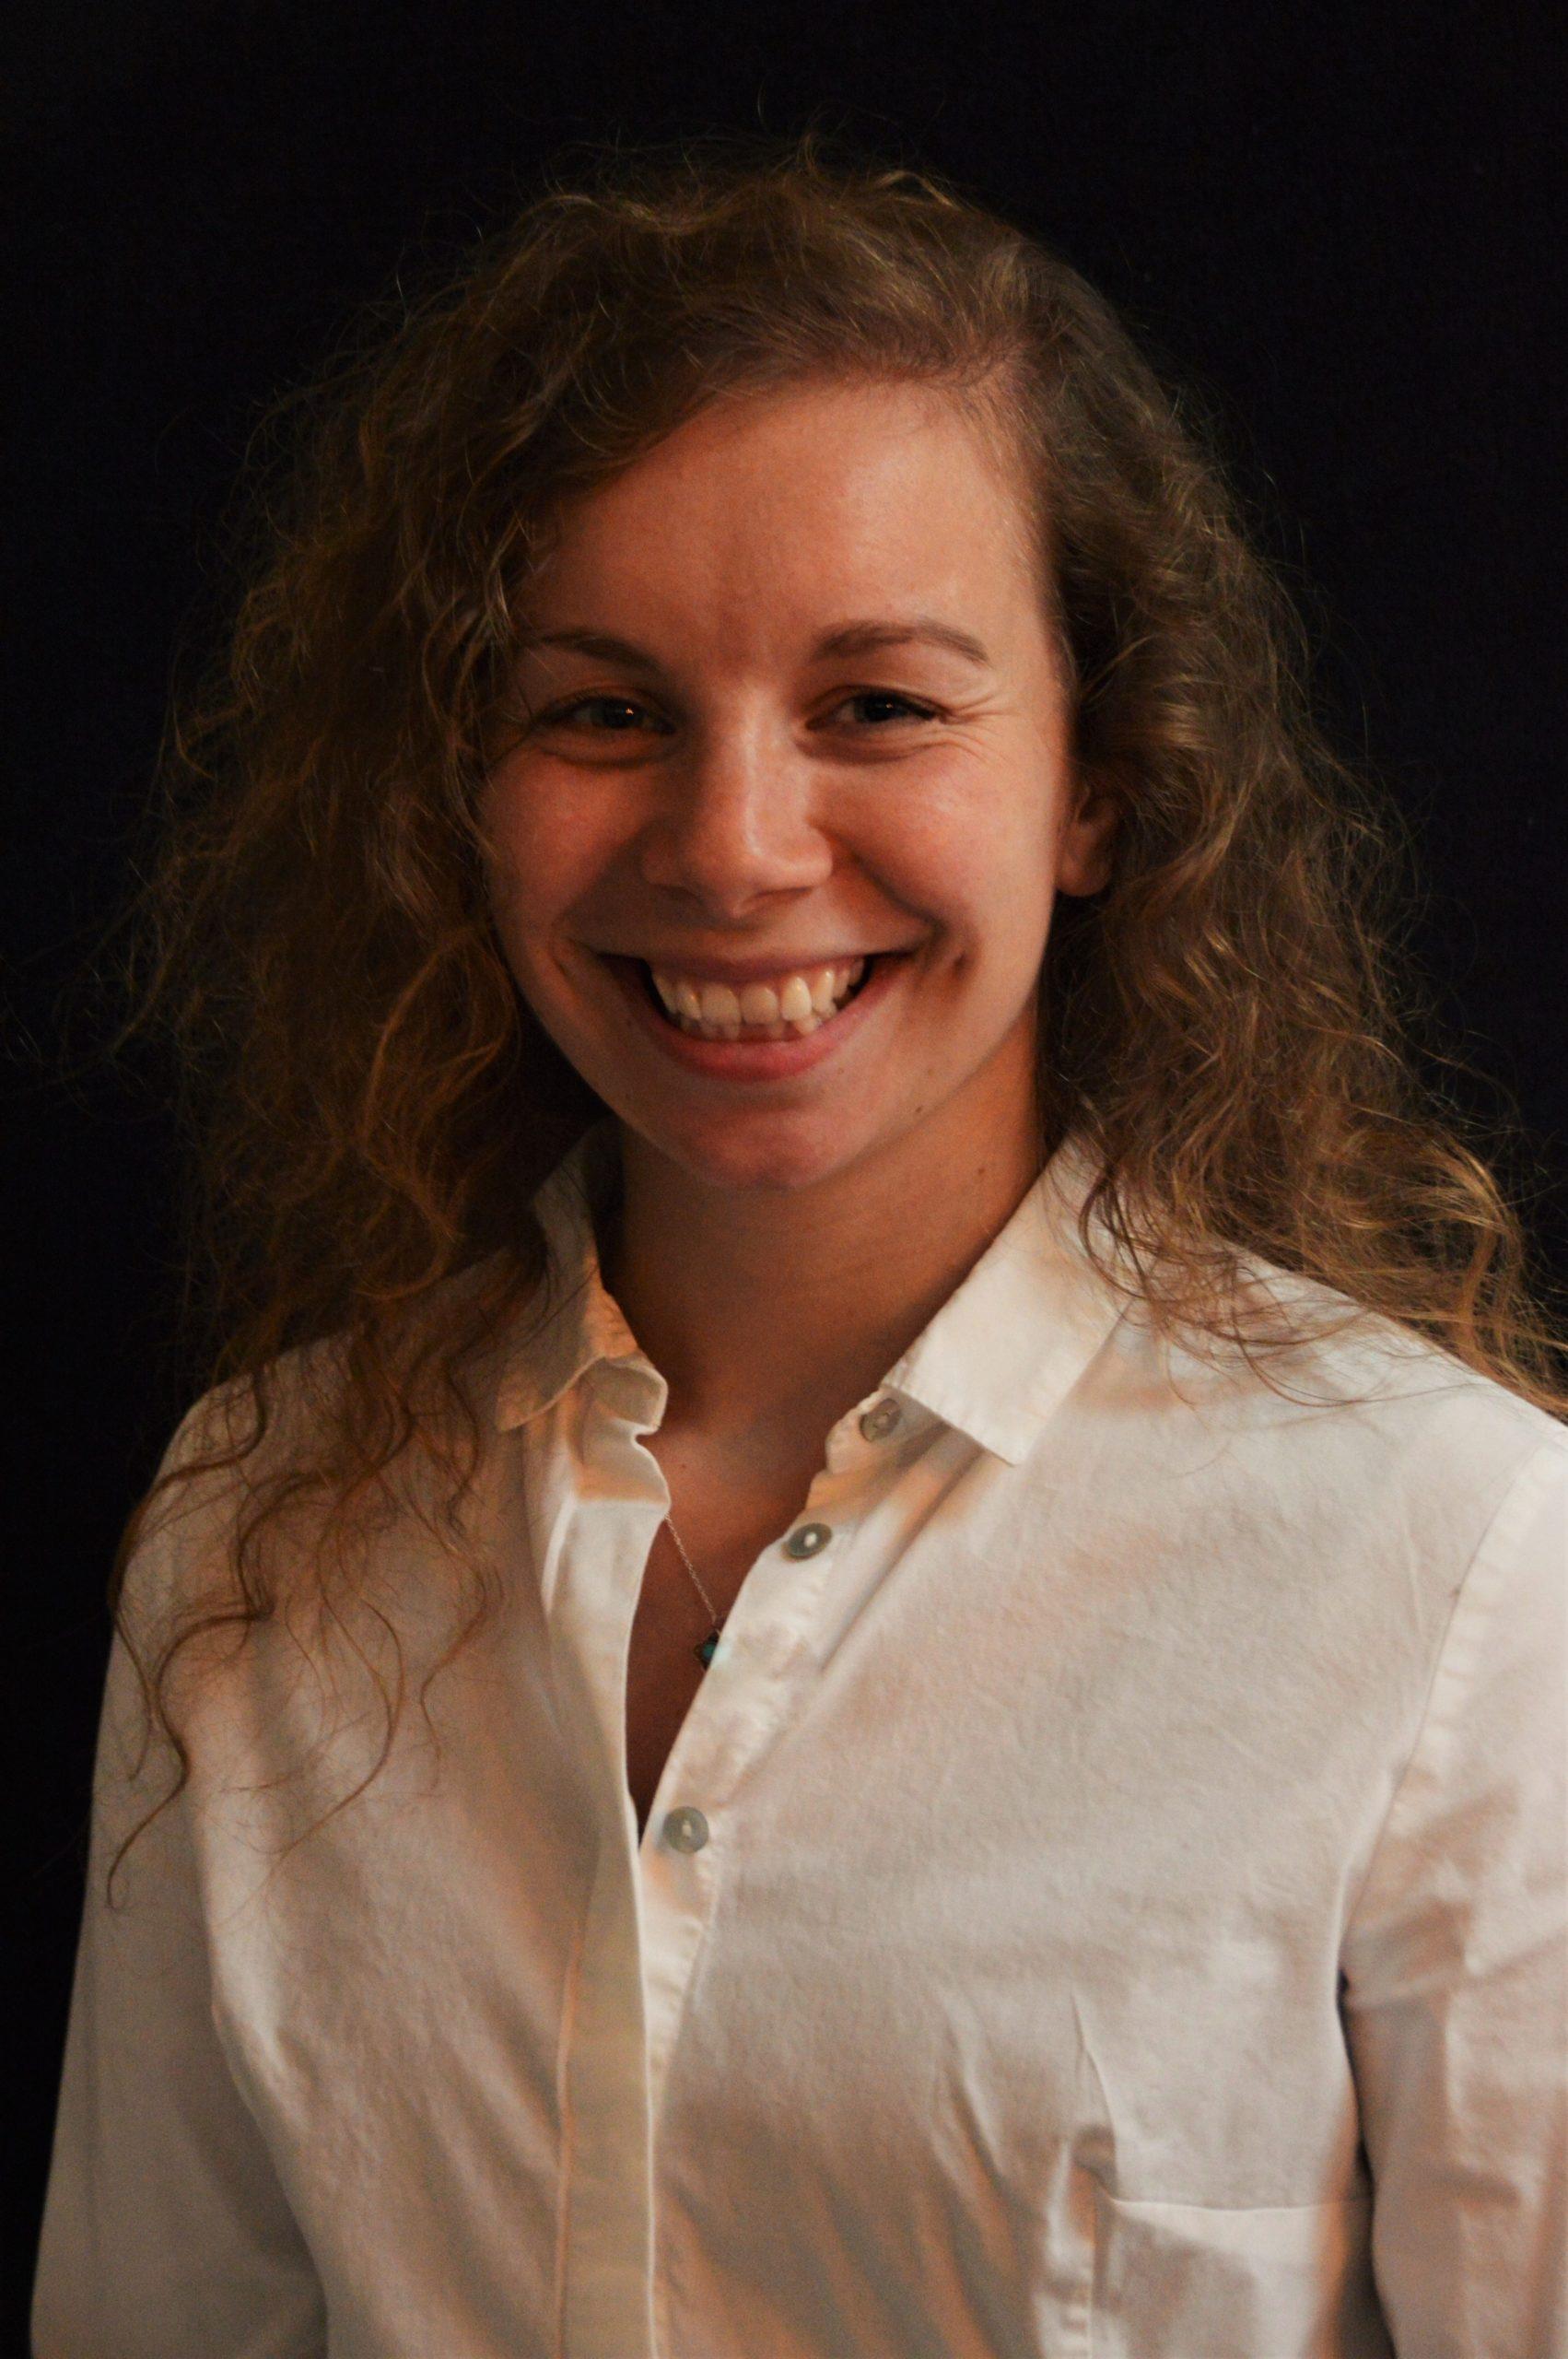 Freelancer Sophie van der Pluijm